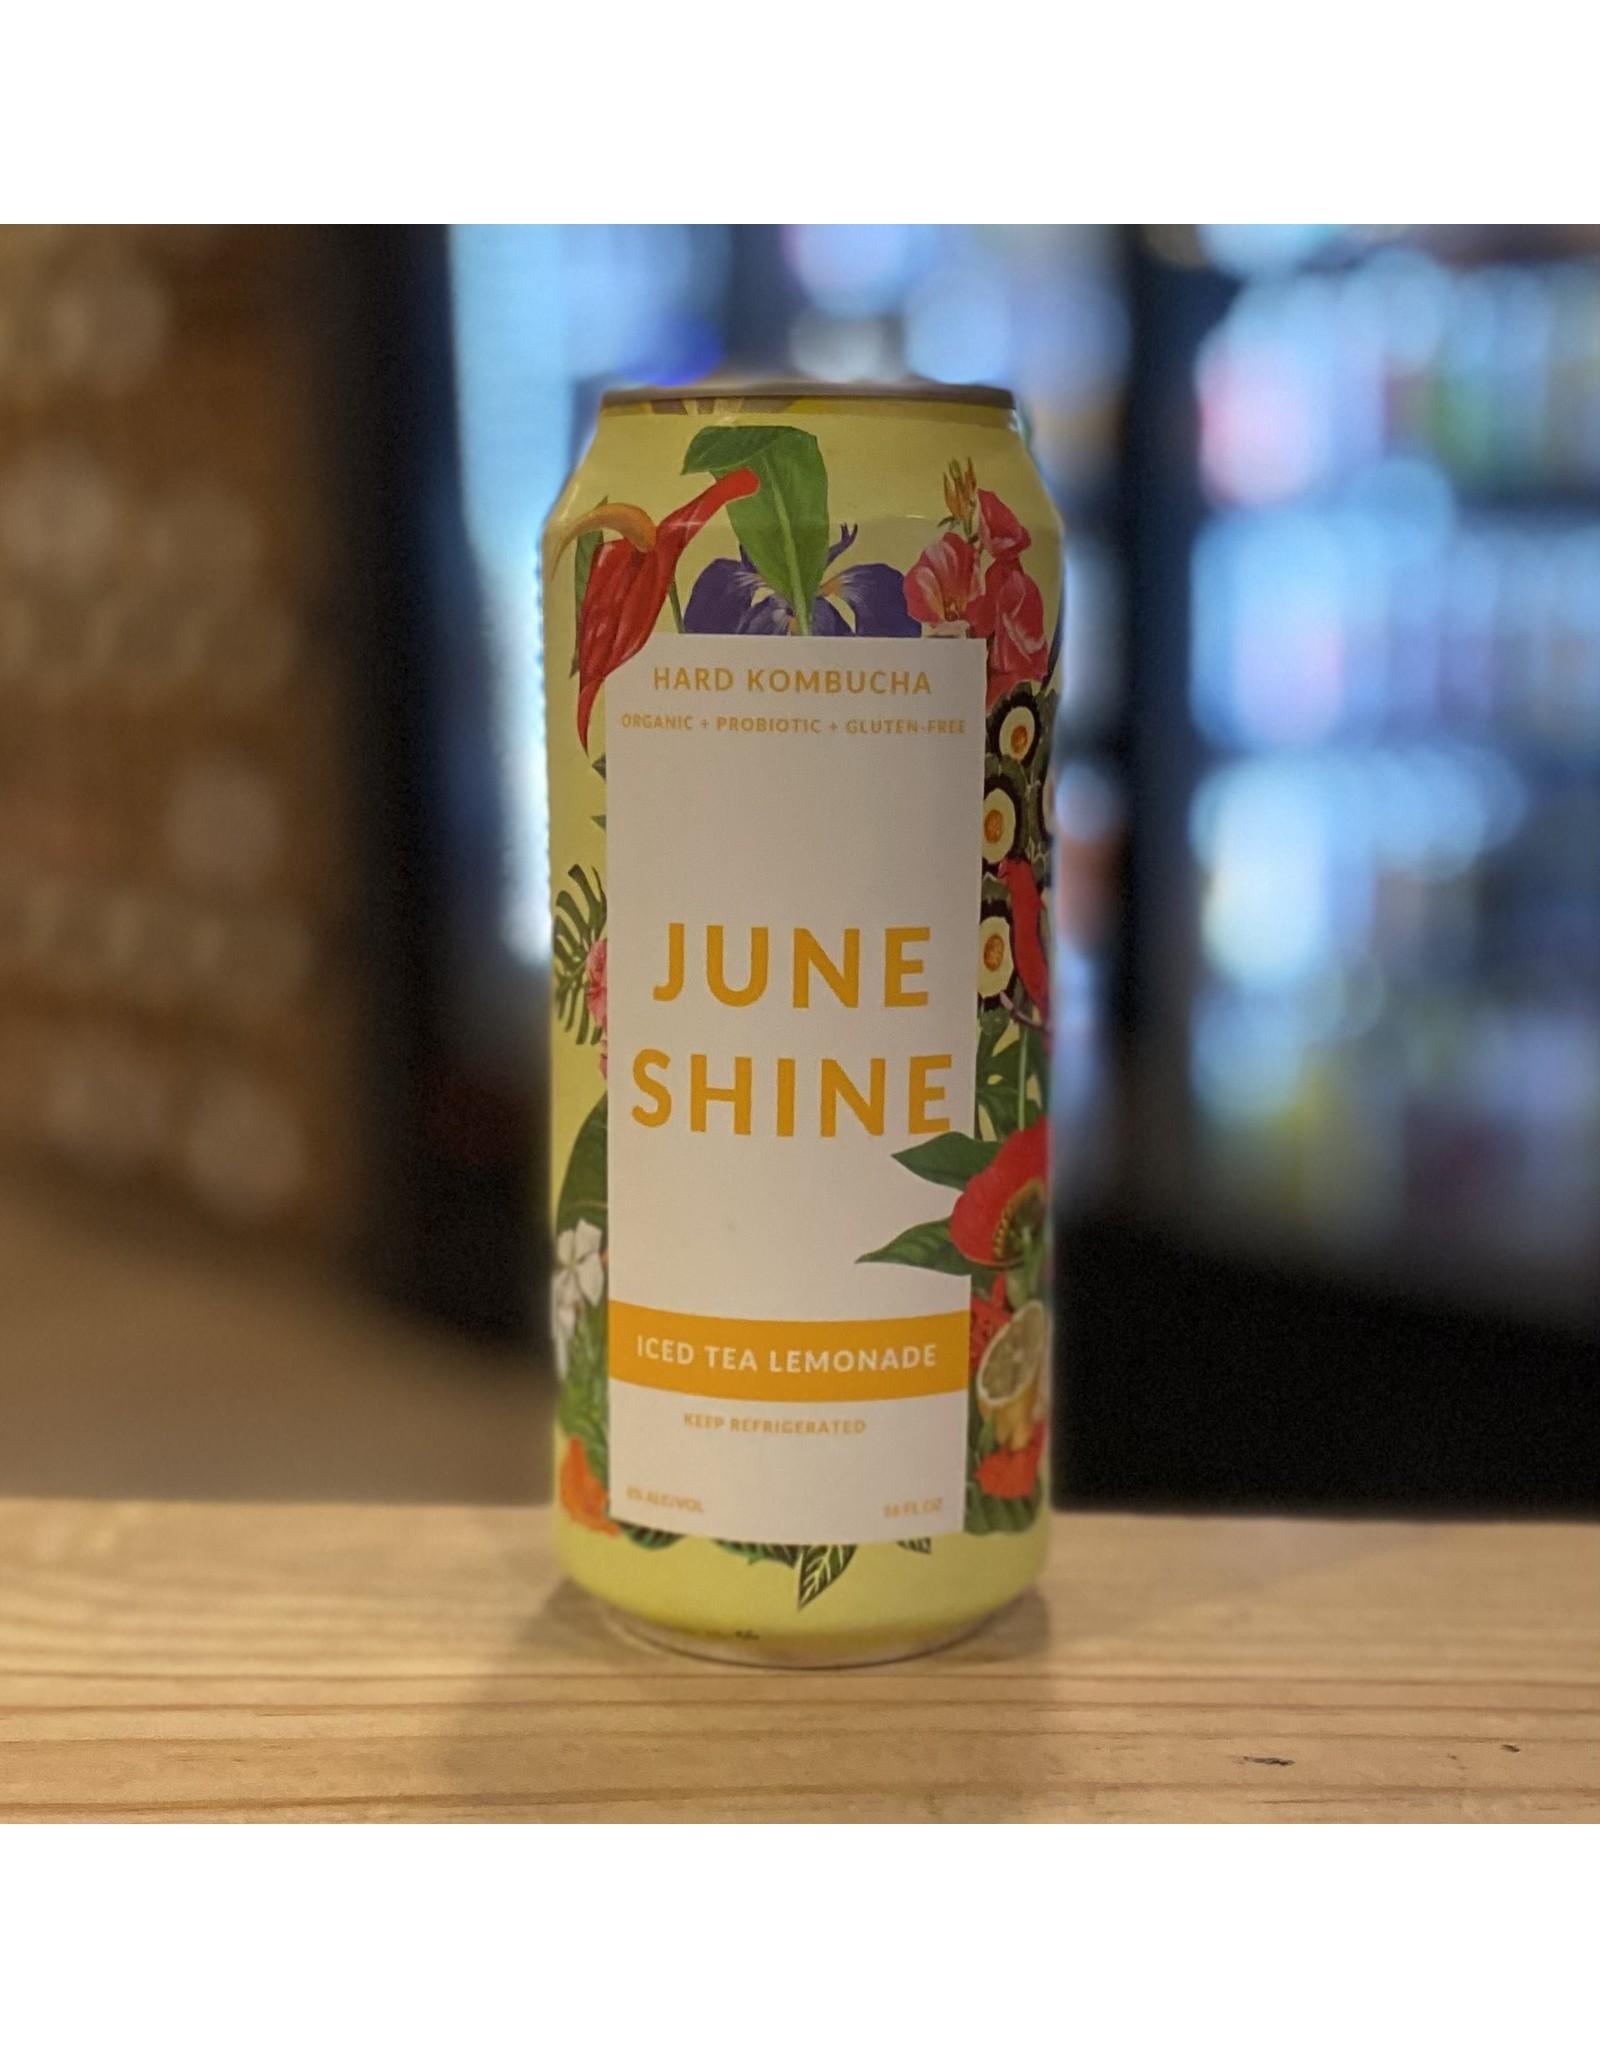 "June Shine ""Iced Tea Lemonade"" Organic Hard Kombucha - San Diego, CA"